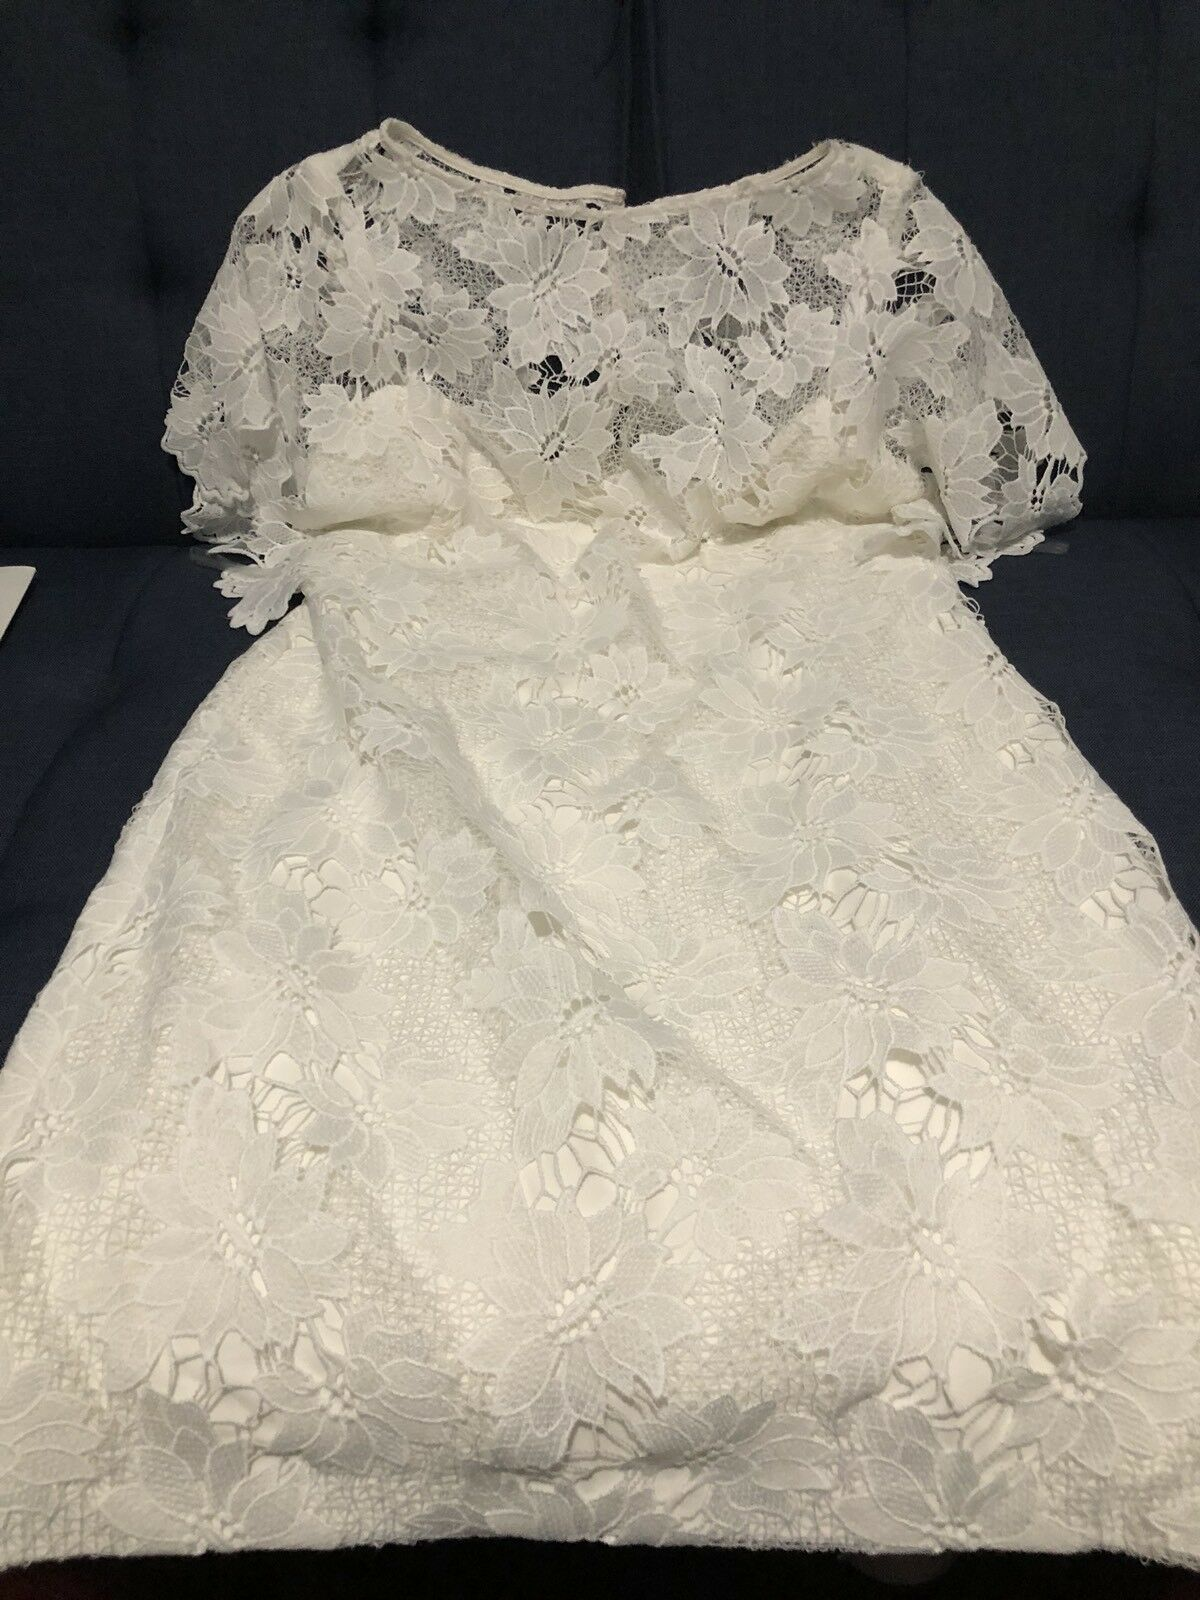 NWT Weiß Crochet Lace Lauren Ralph Lauren Dress Größe 10 Größe10 New